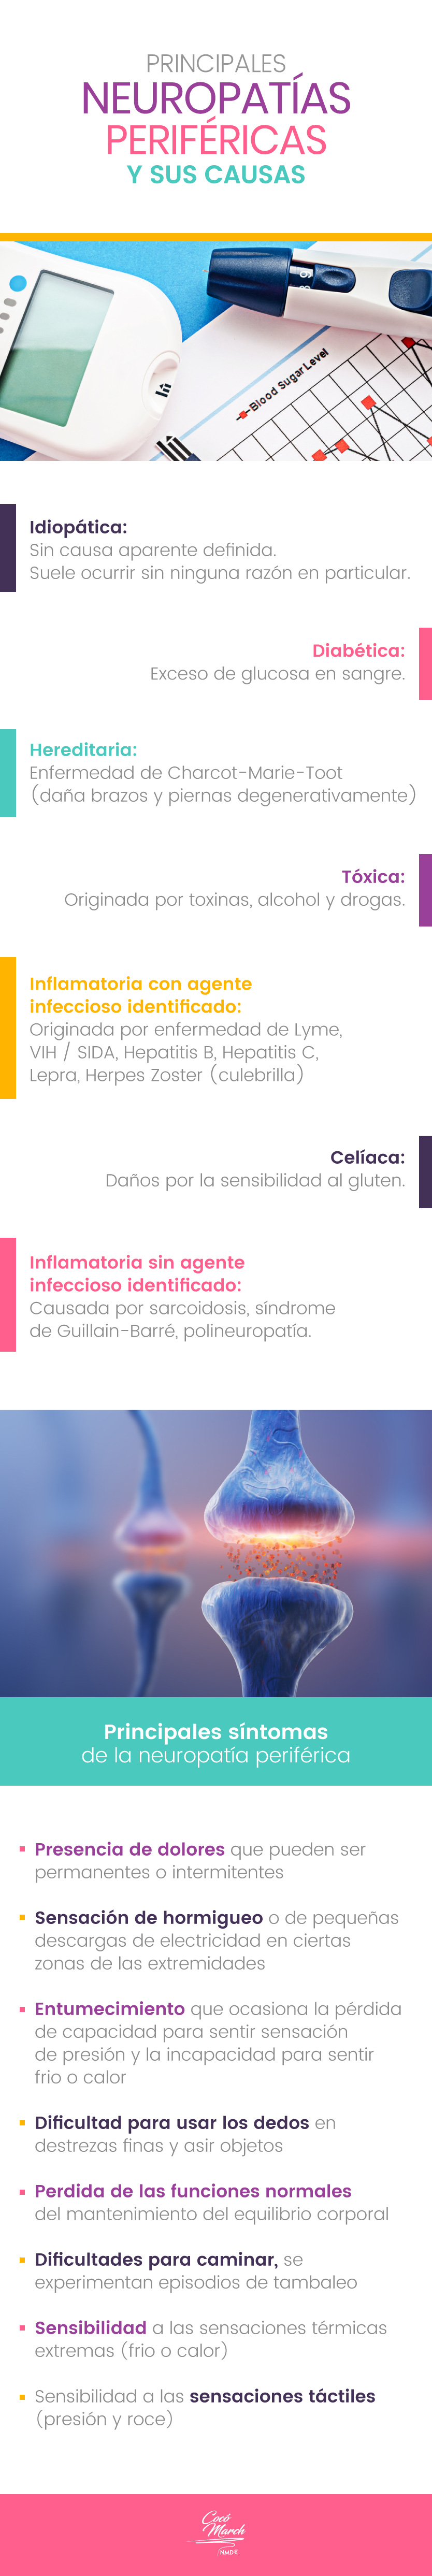 principales-neuropatias-perifericas